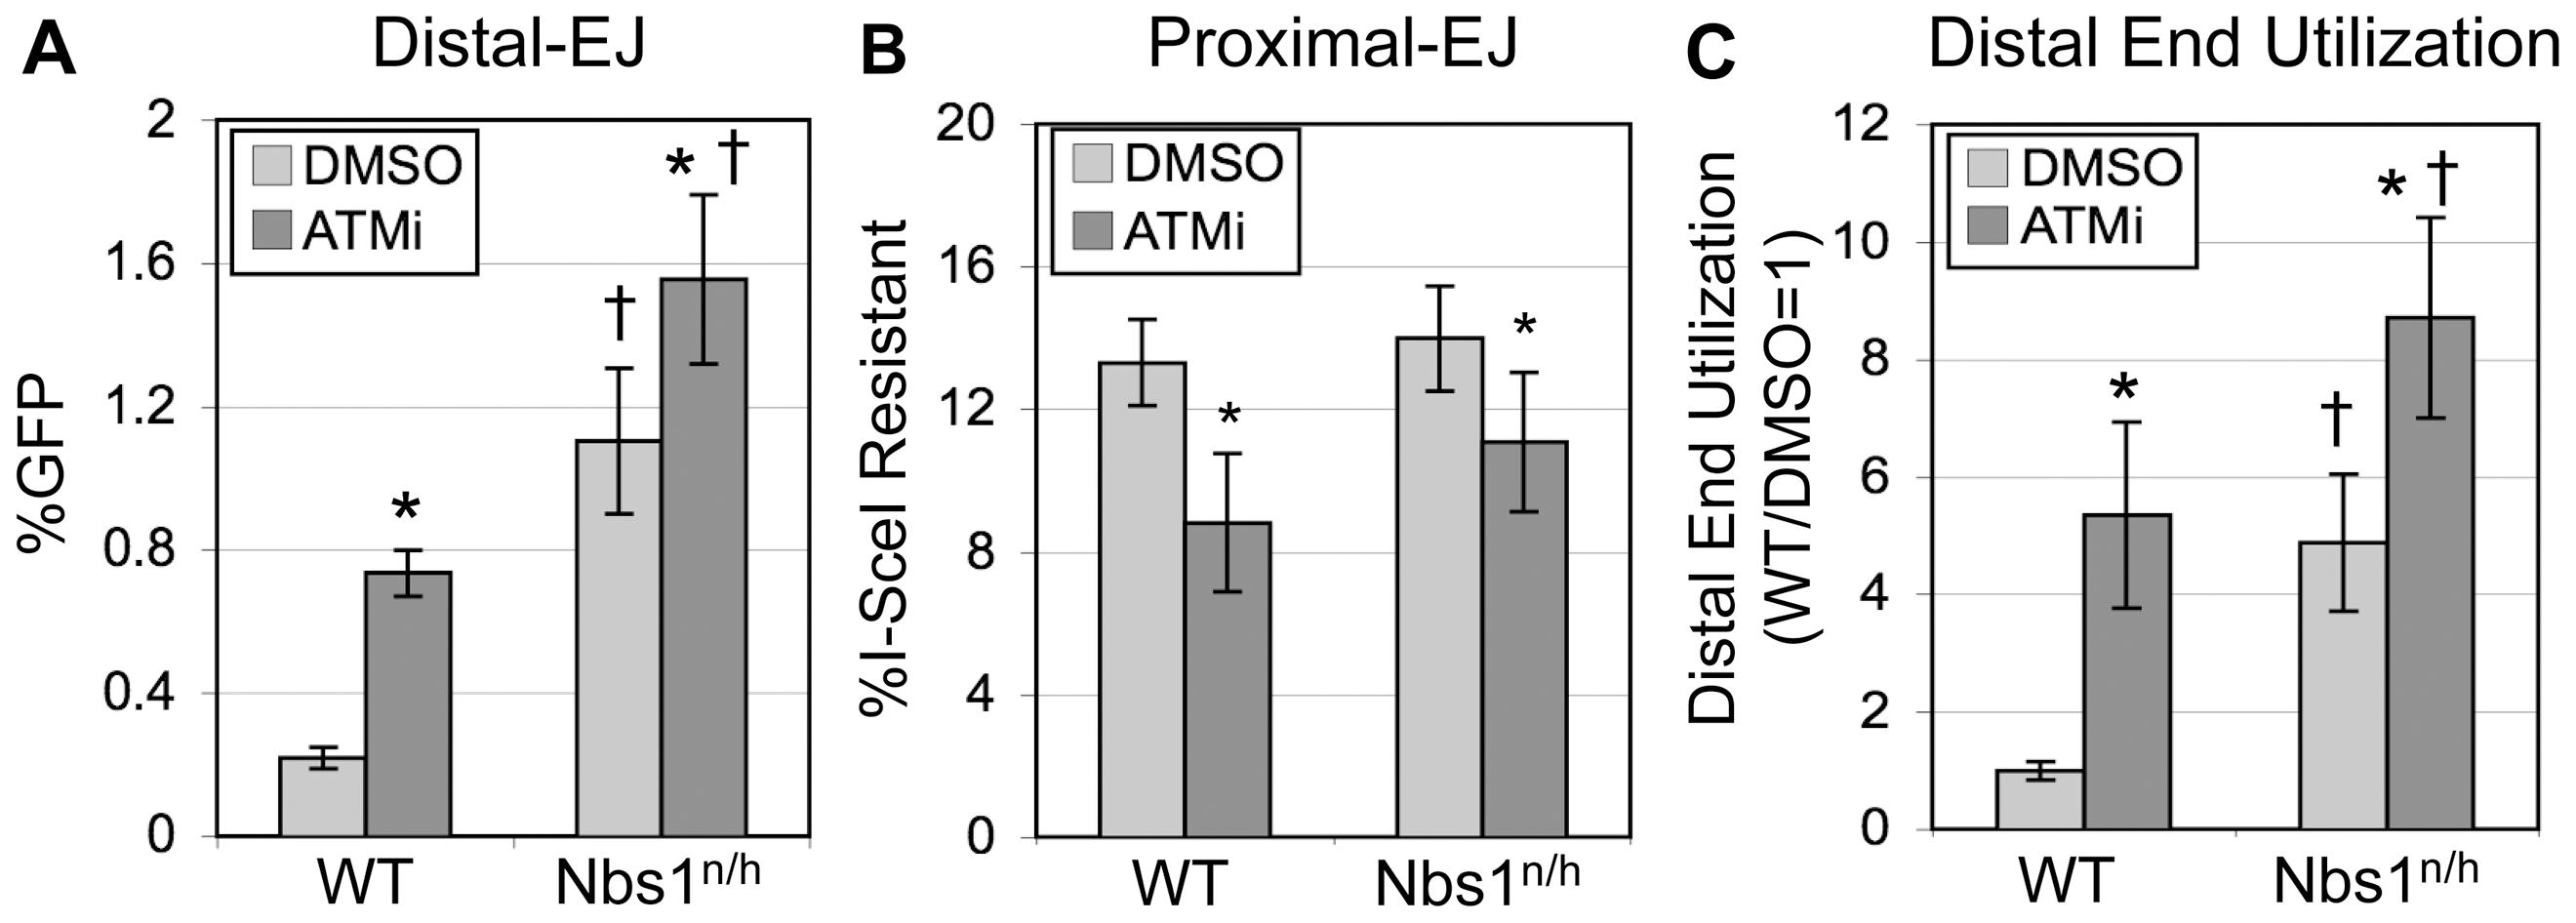 Nbs1 suppresses Distal-EJ to a similar degree as ATM.